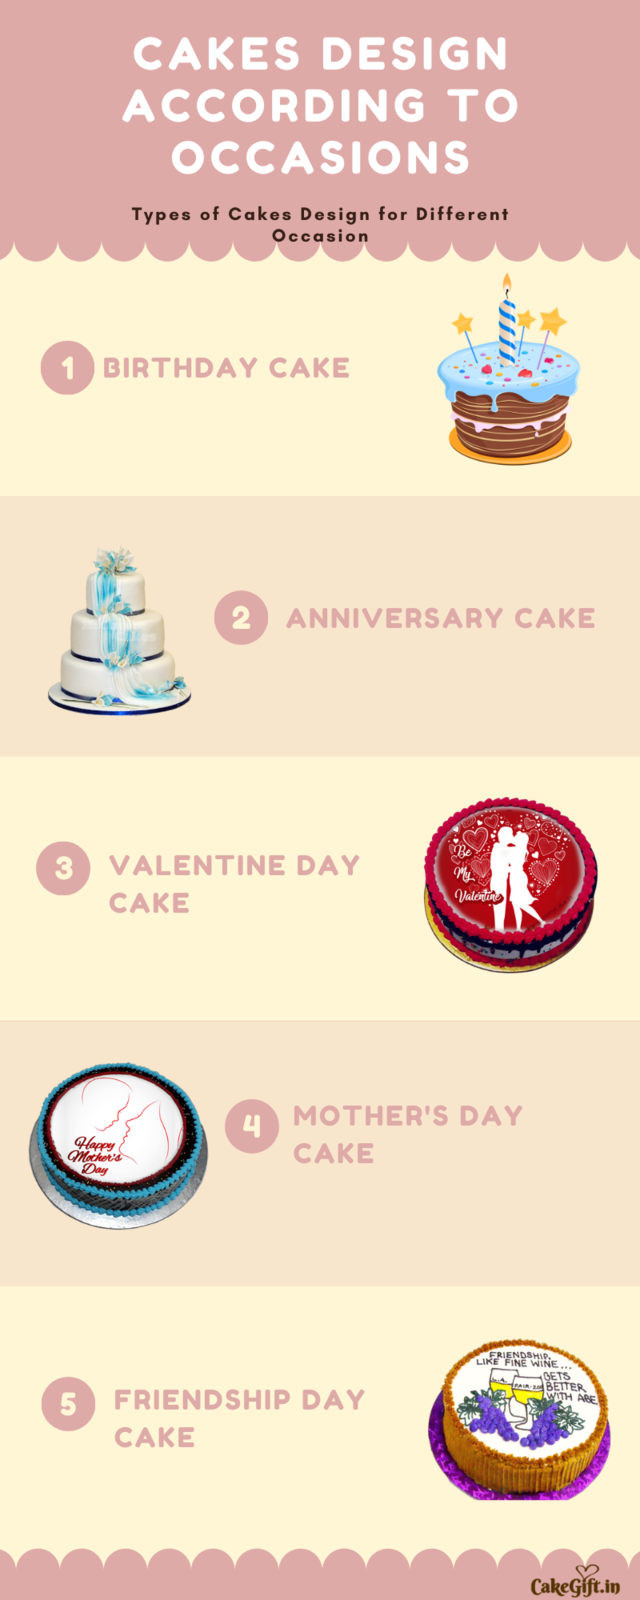 Cake design according to occasion